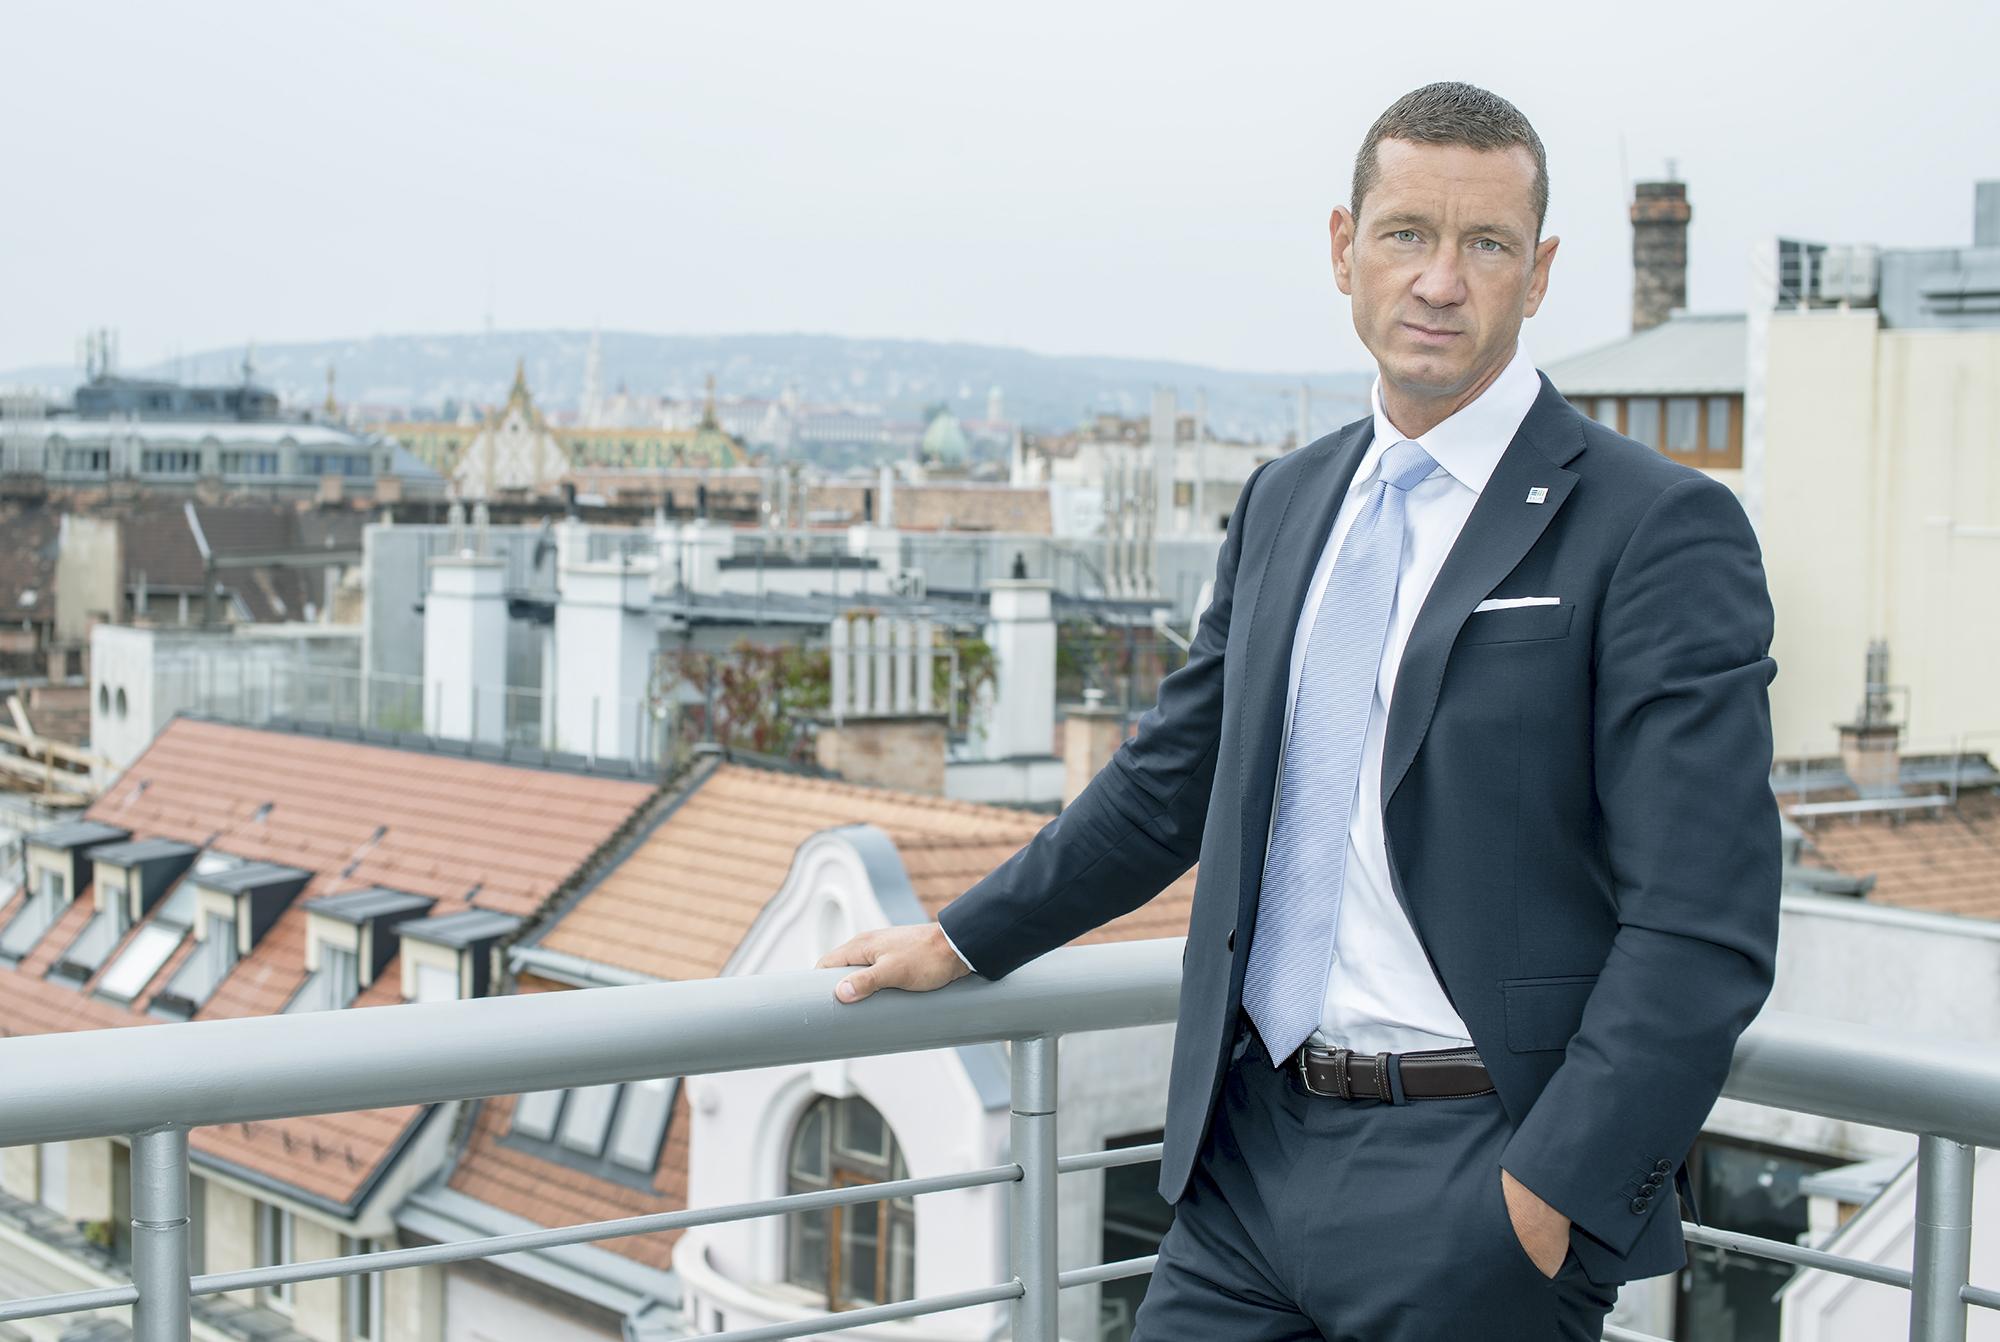 Istvan_SZABO deputy head of EXIM Bank of Hungary